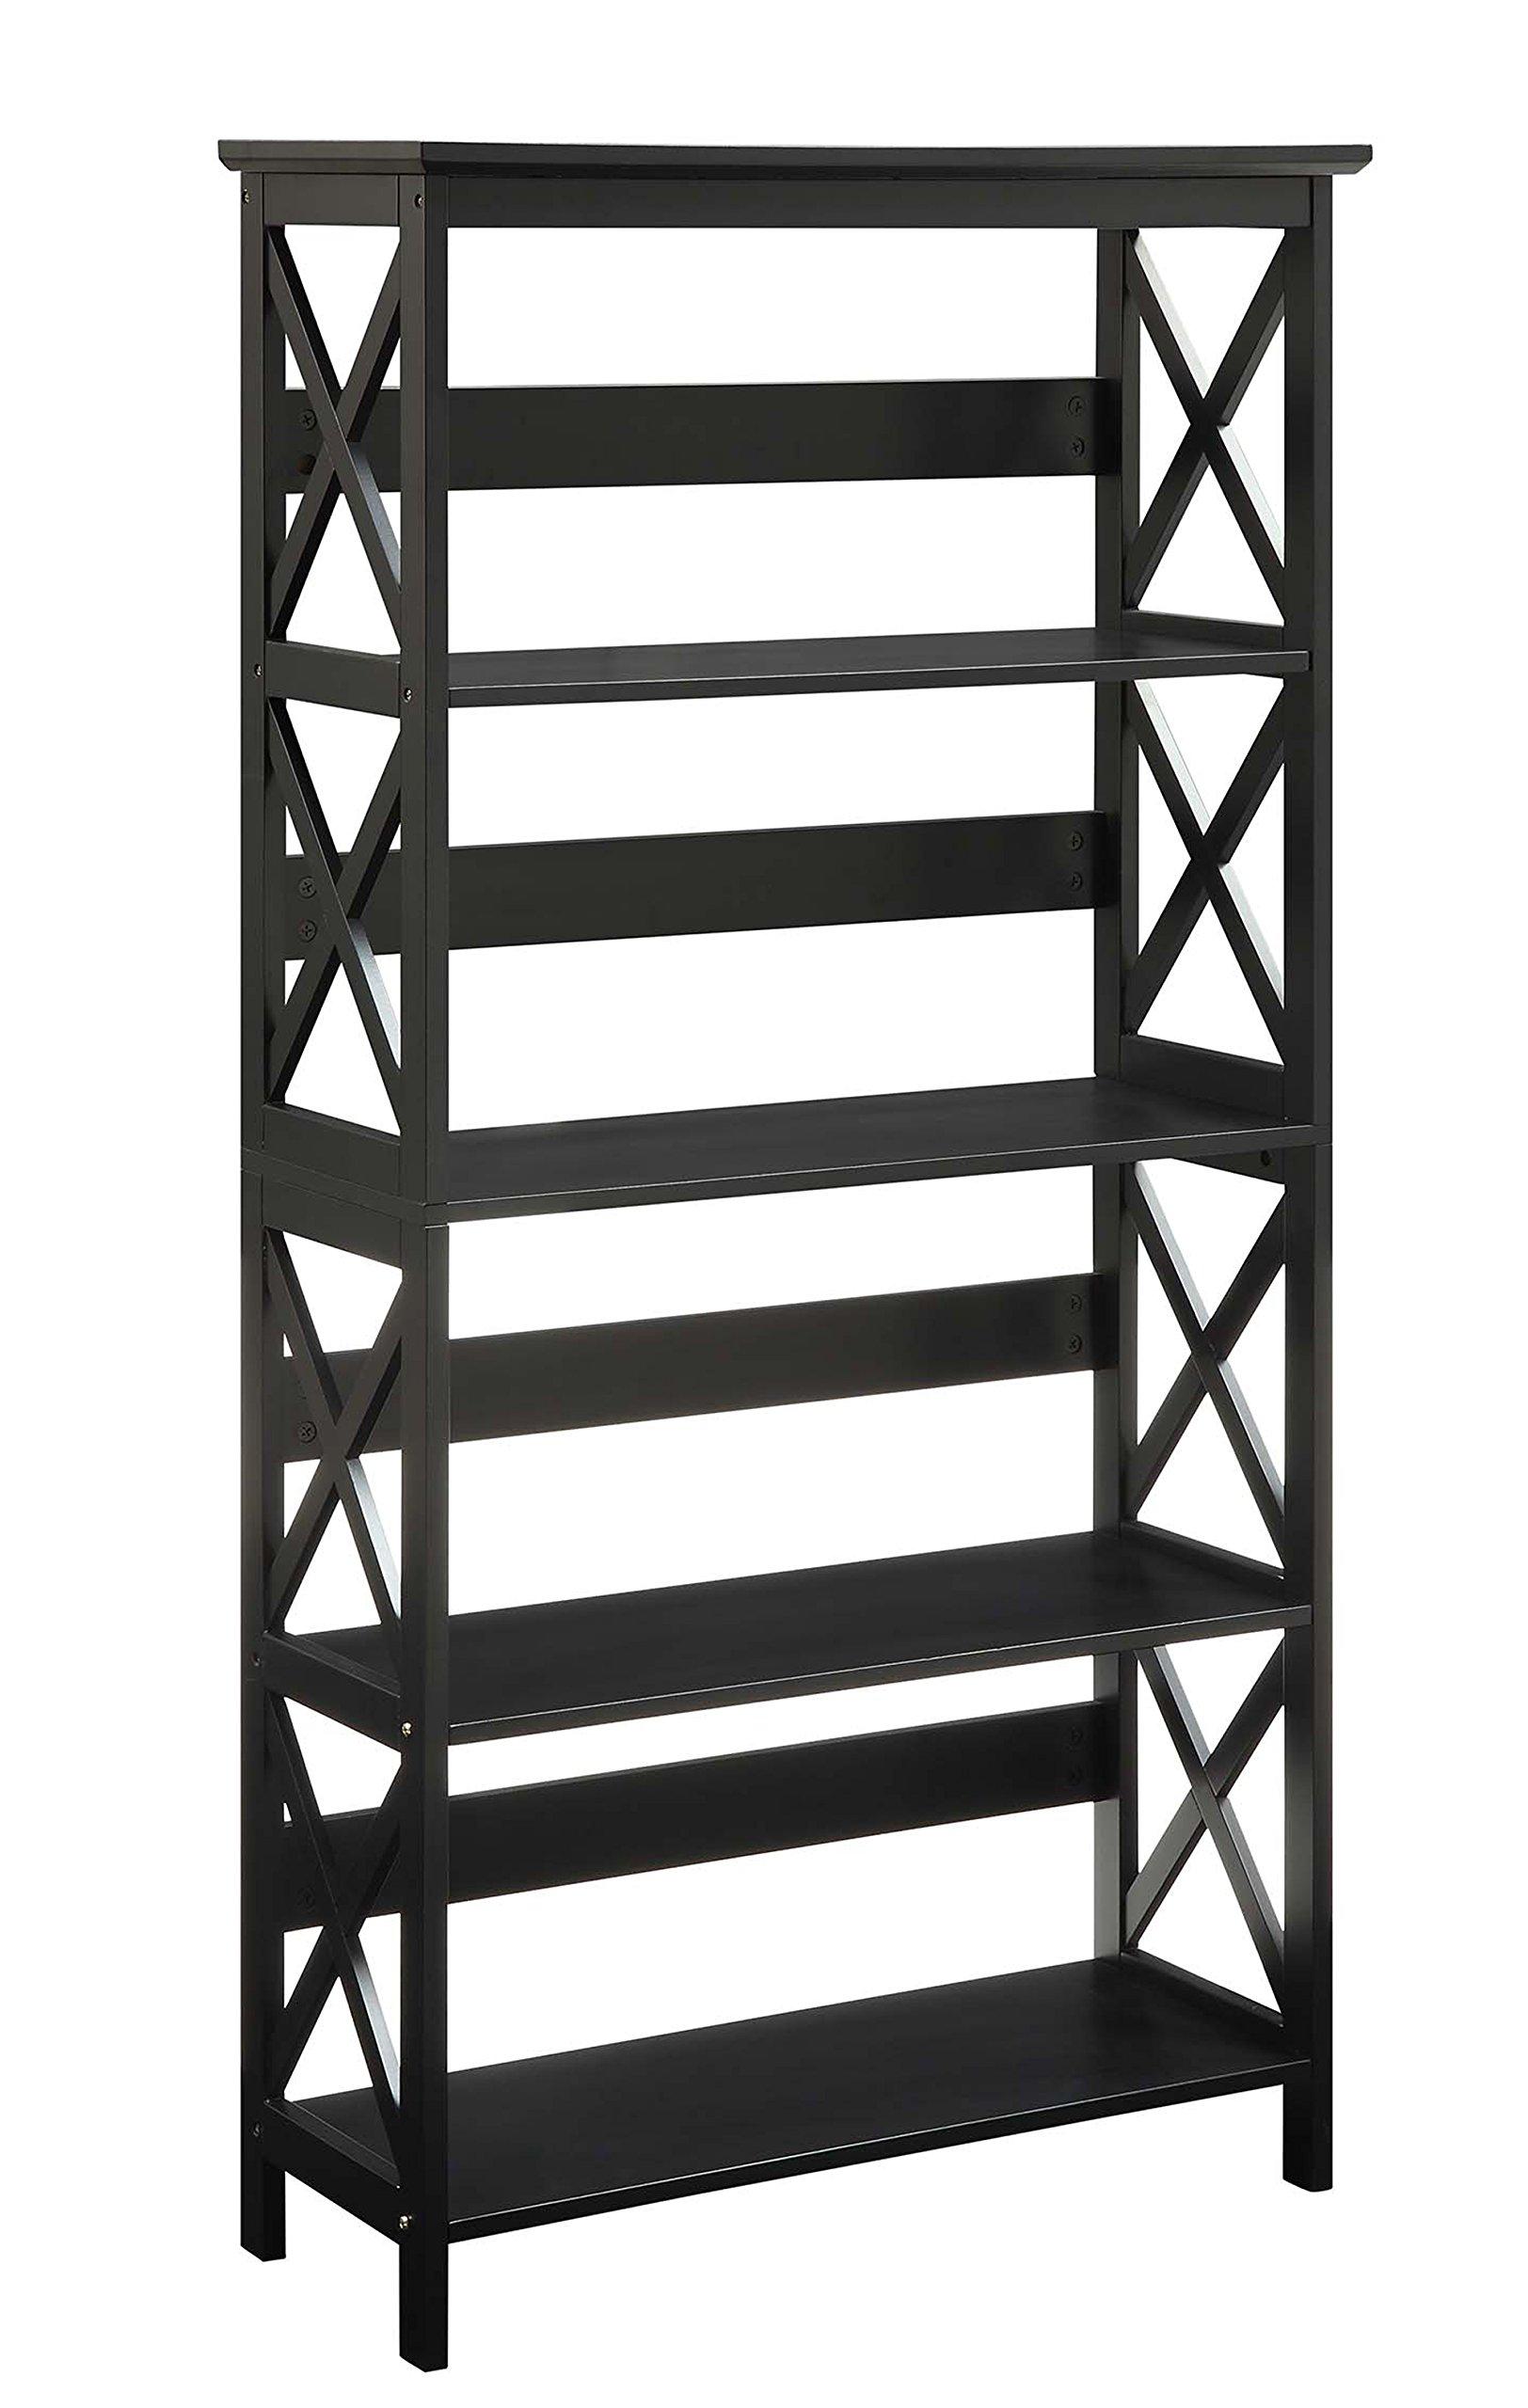 Convenience Concepts Oxford 5-Tier Bookcase, Black